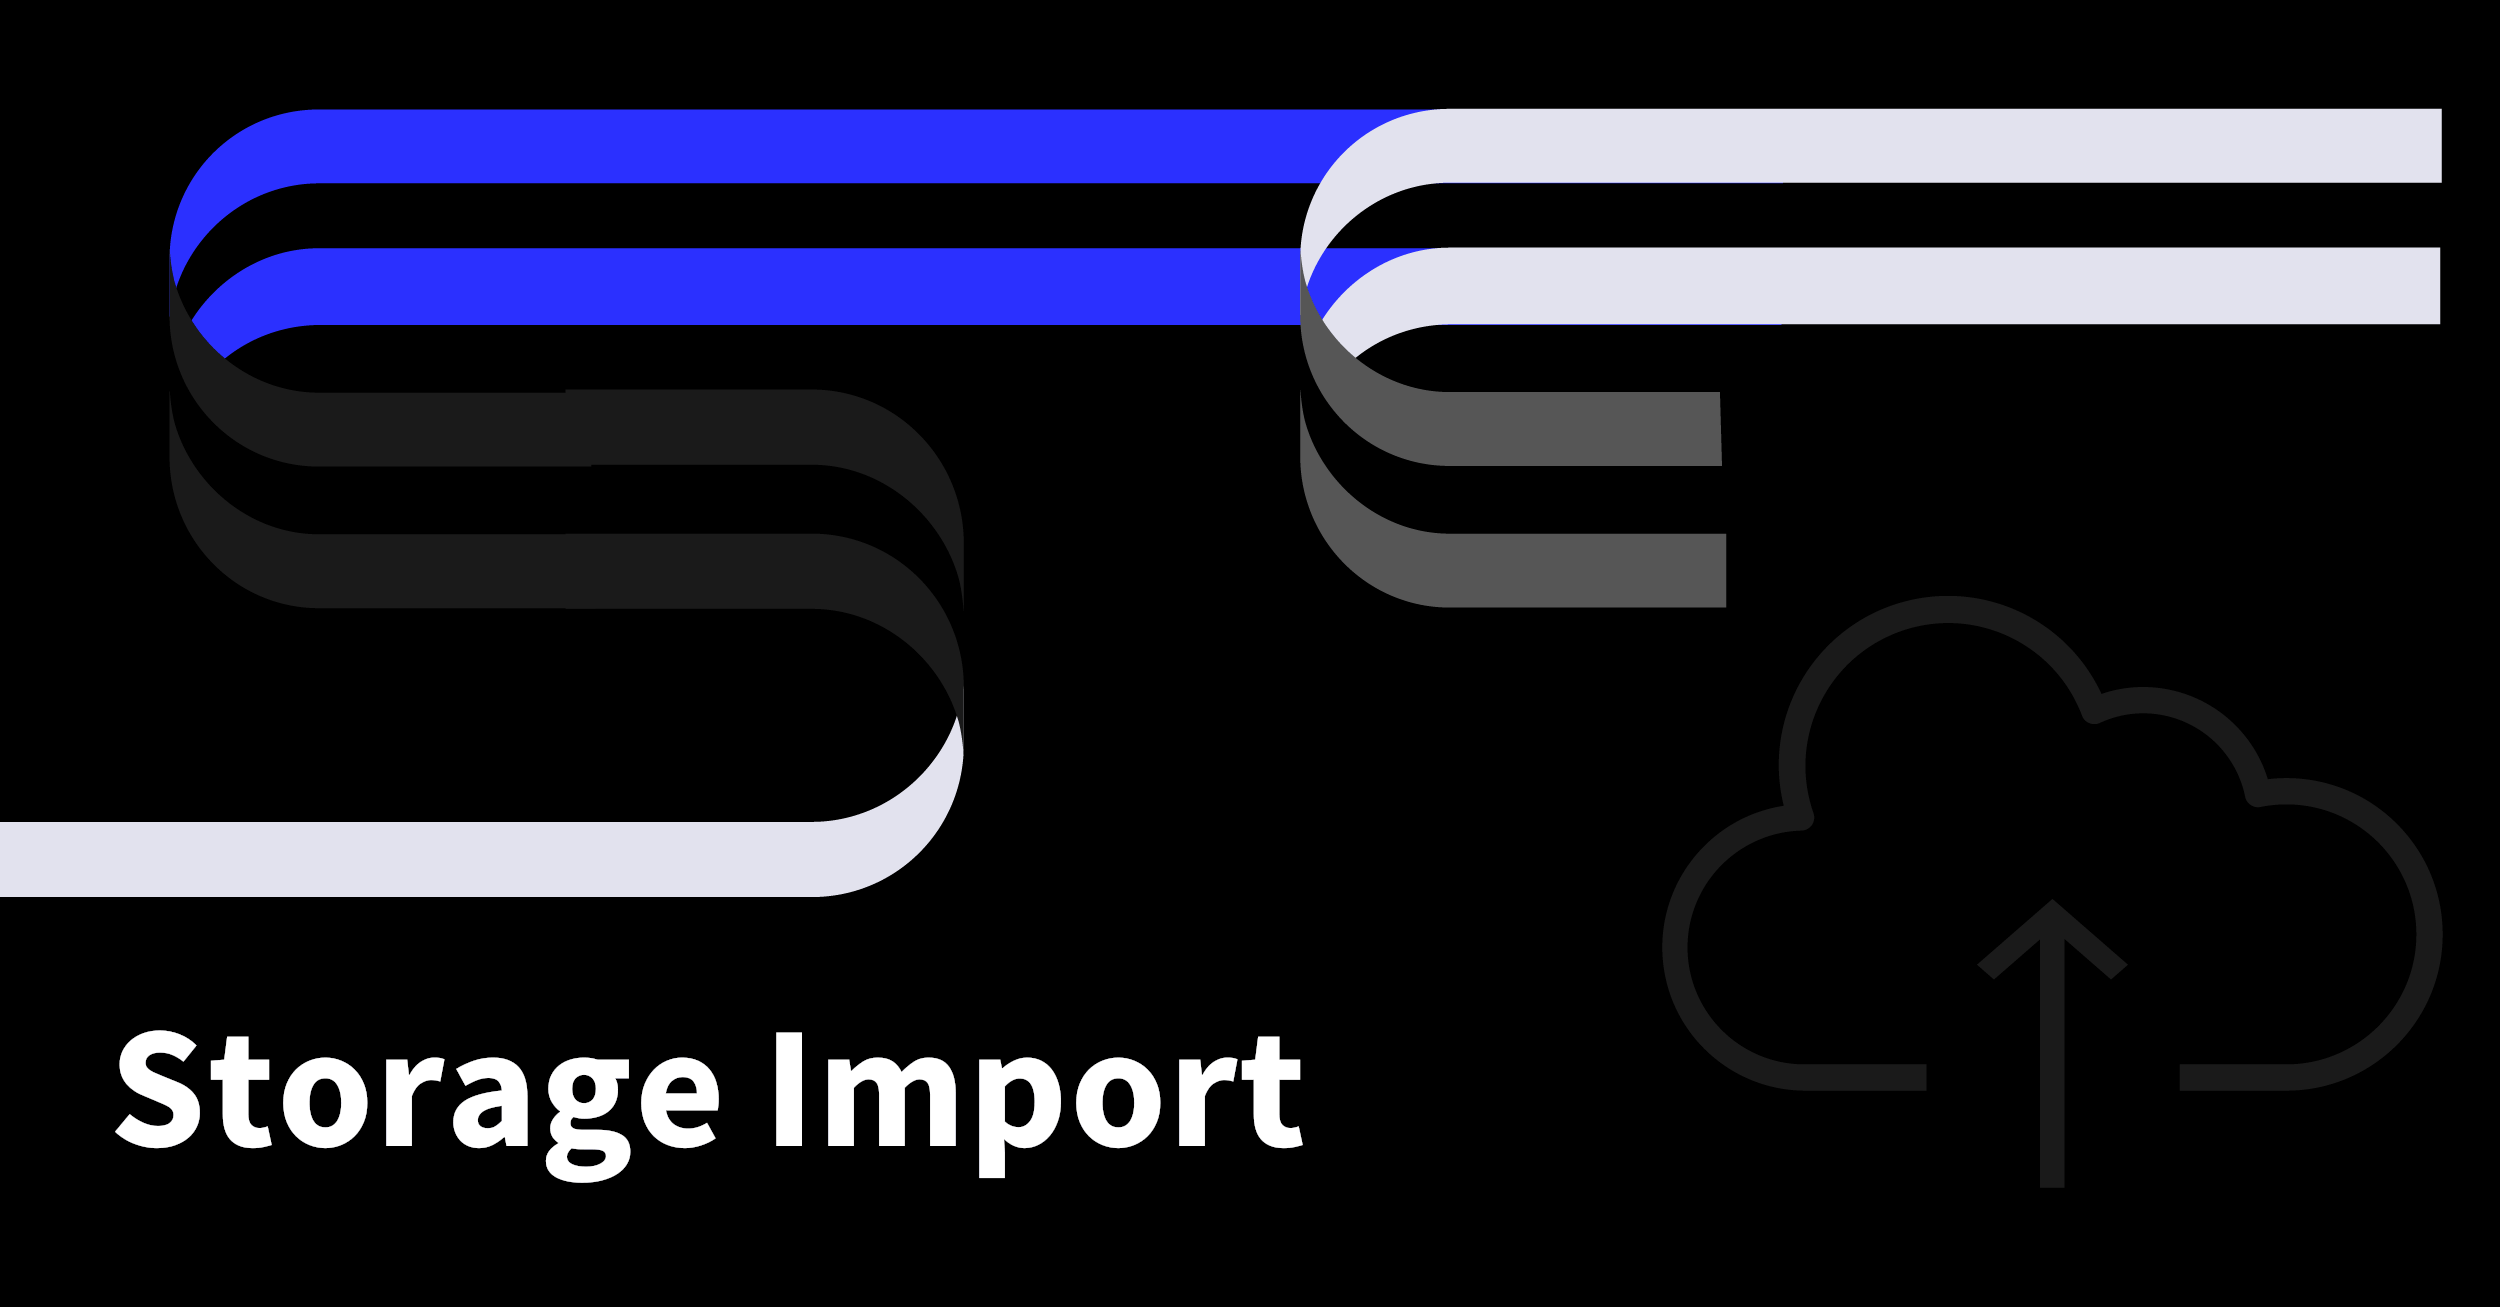 Launching Storage Import